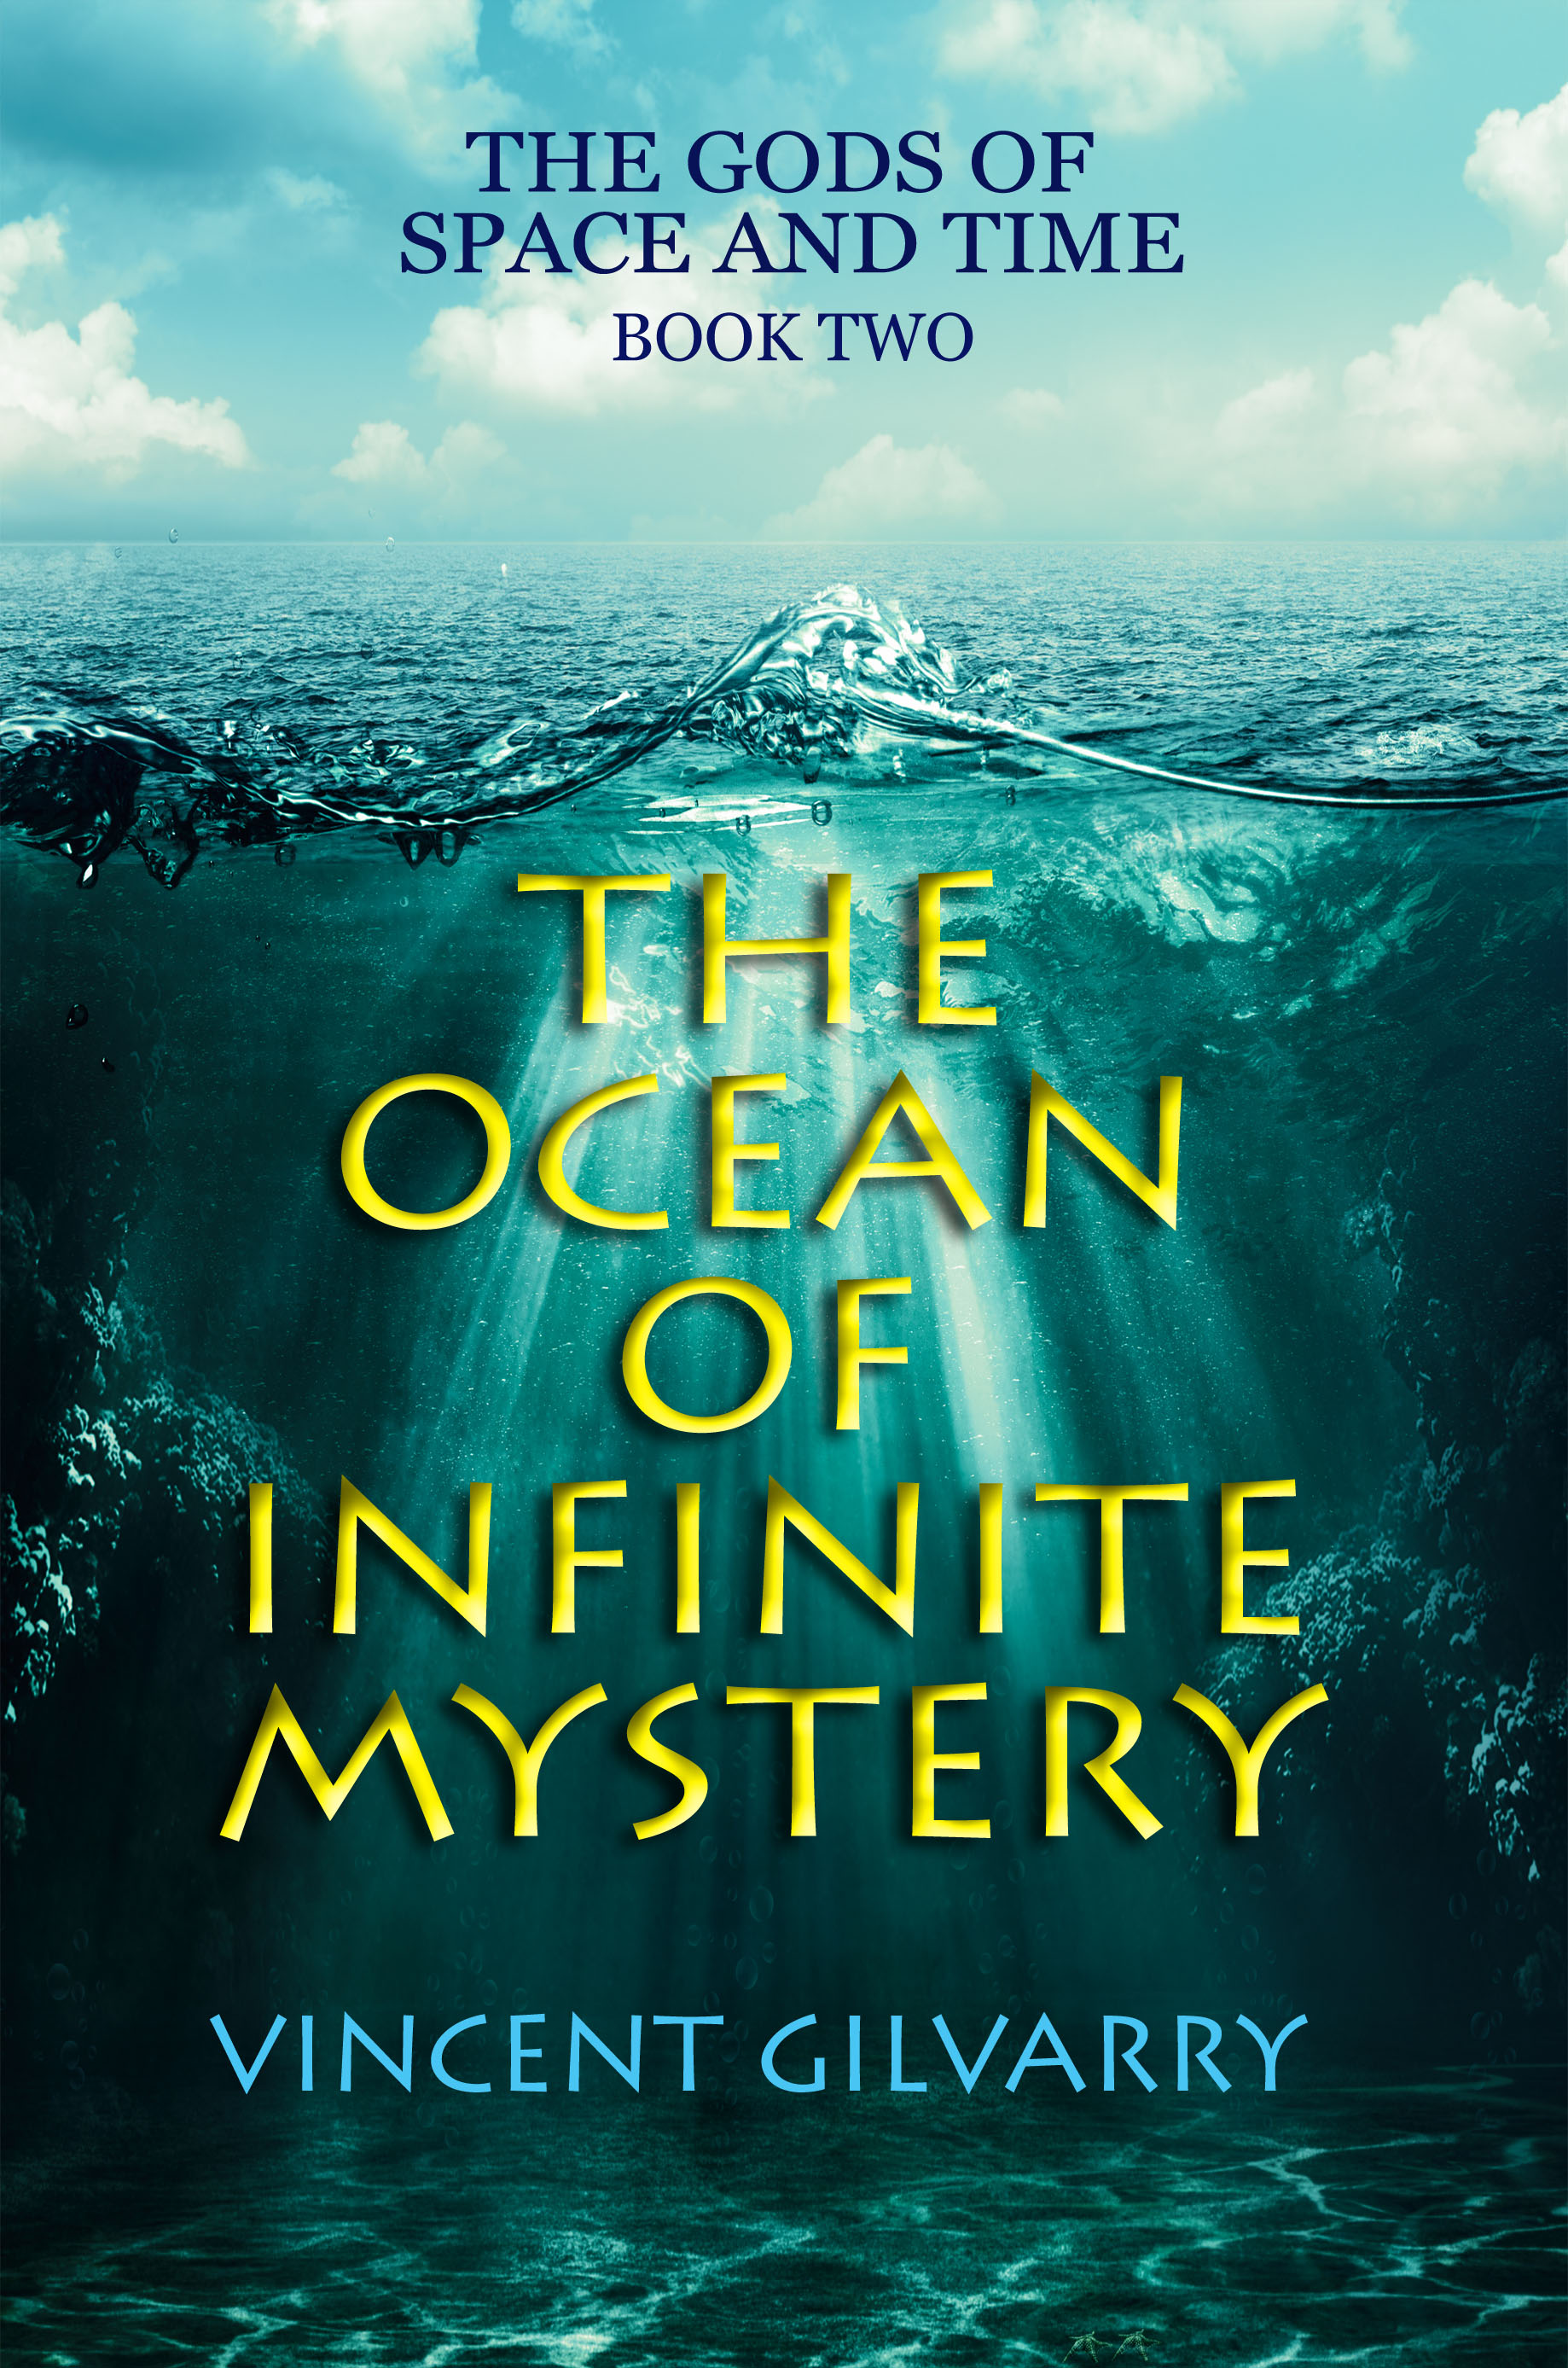 THE OCEAN OF INFINITE MYSTERY